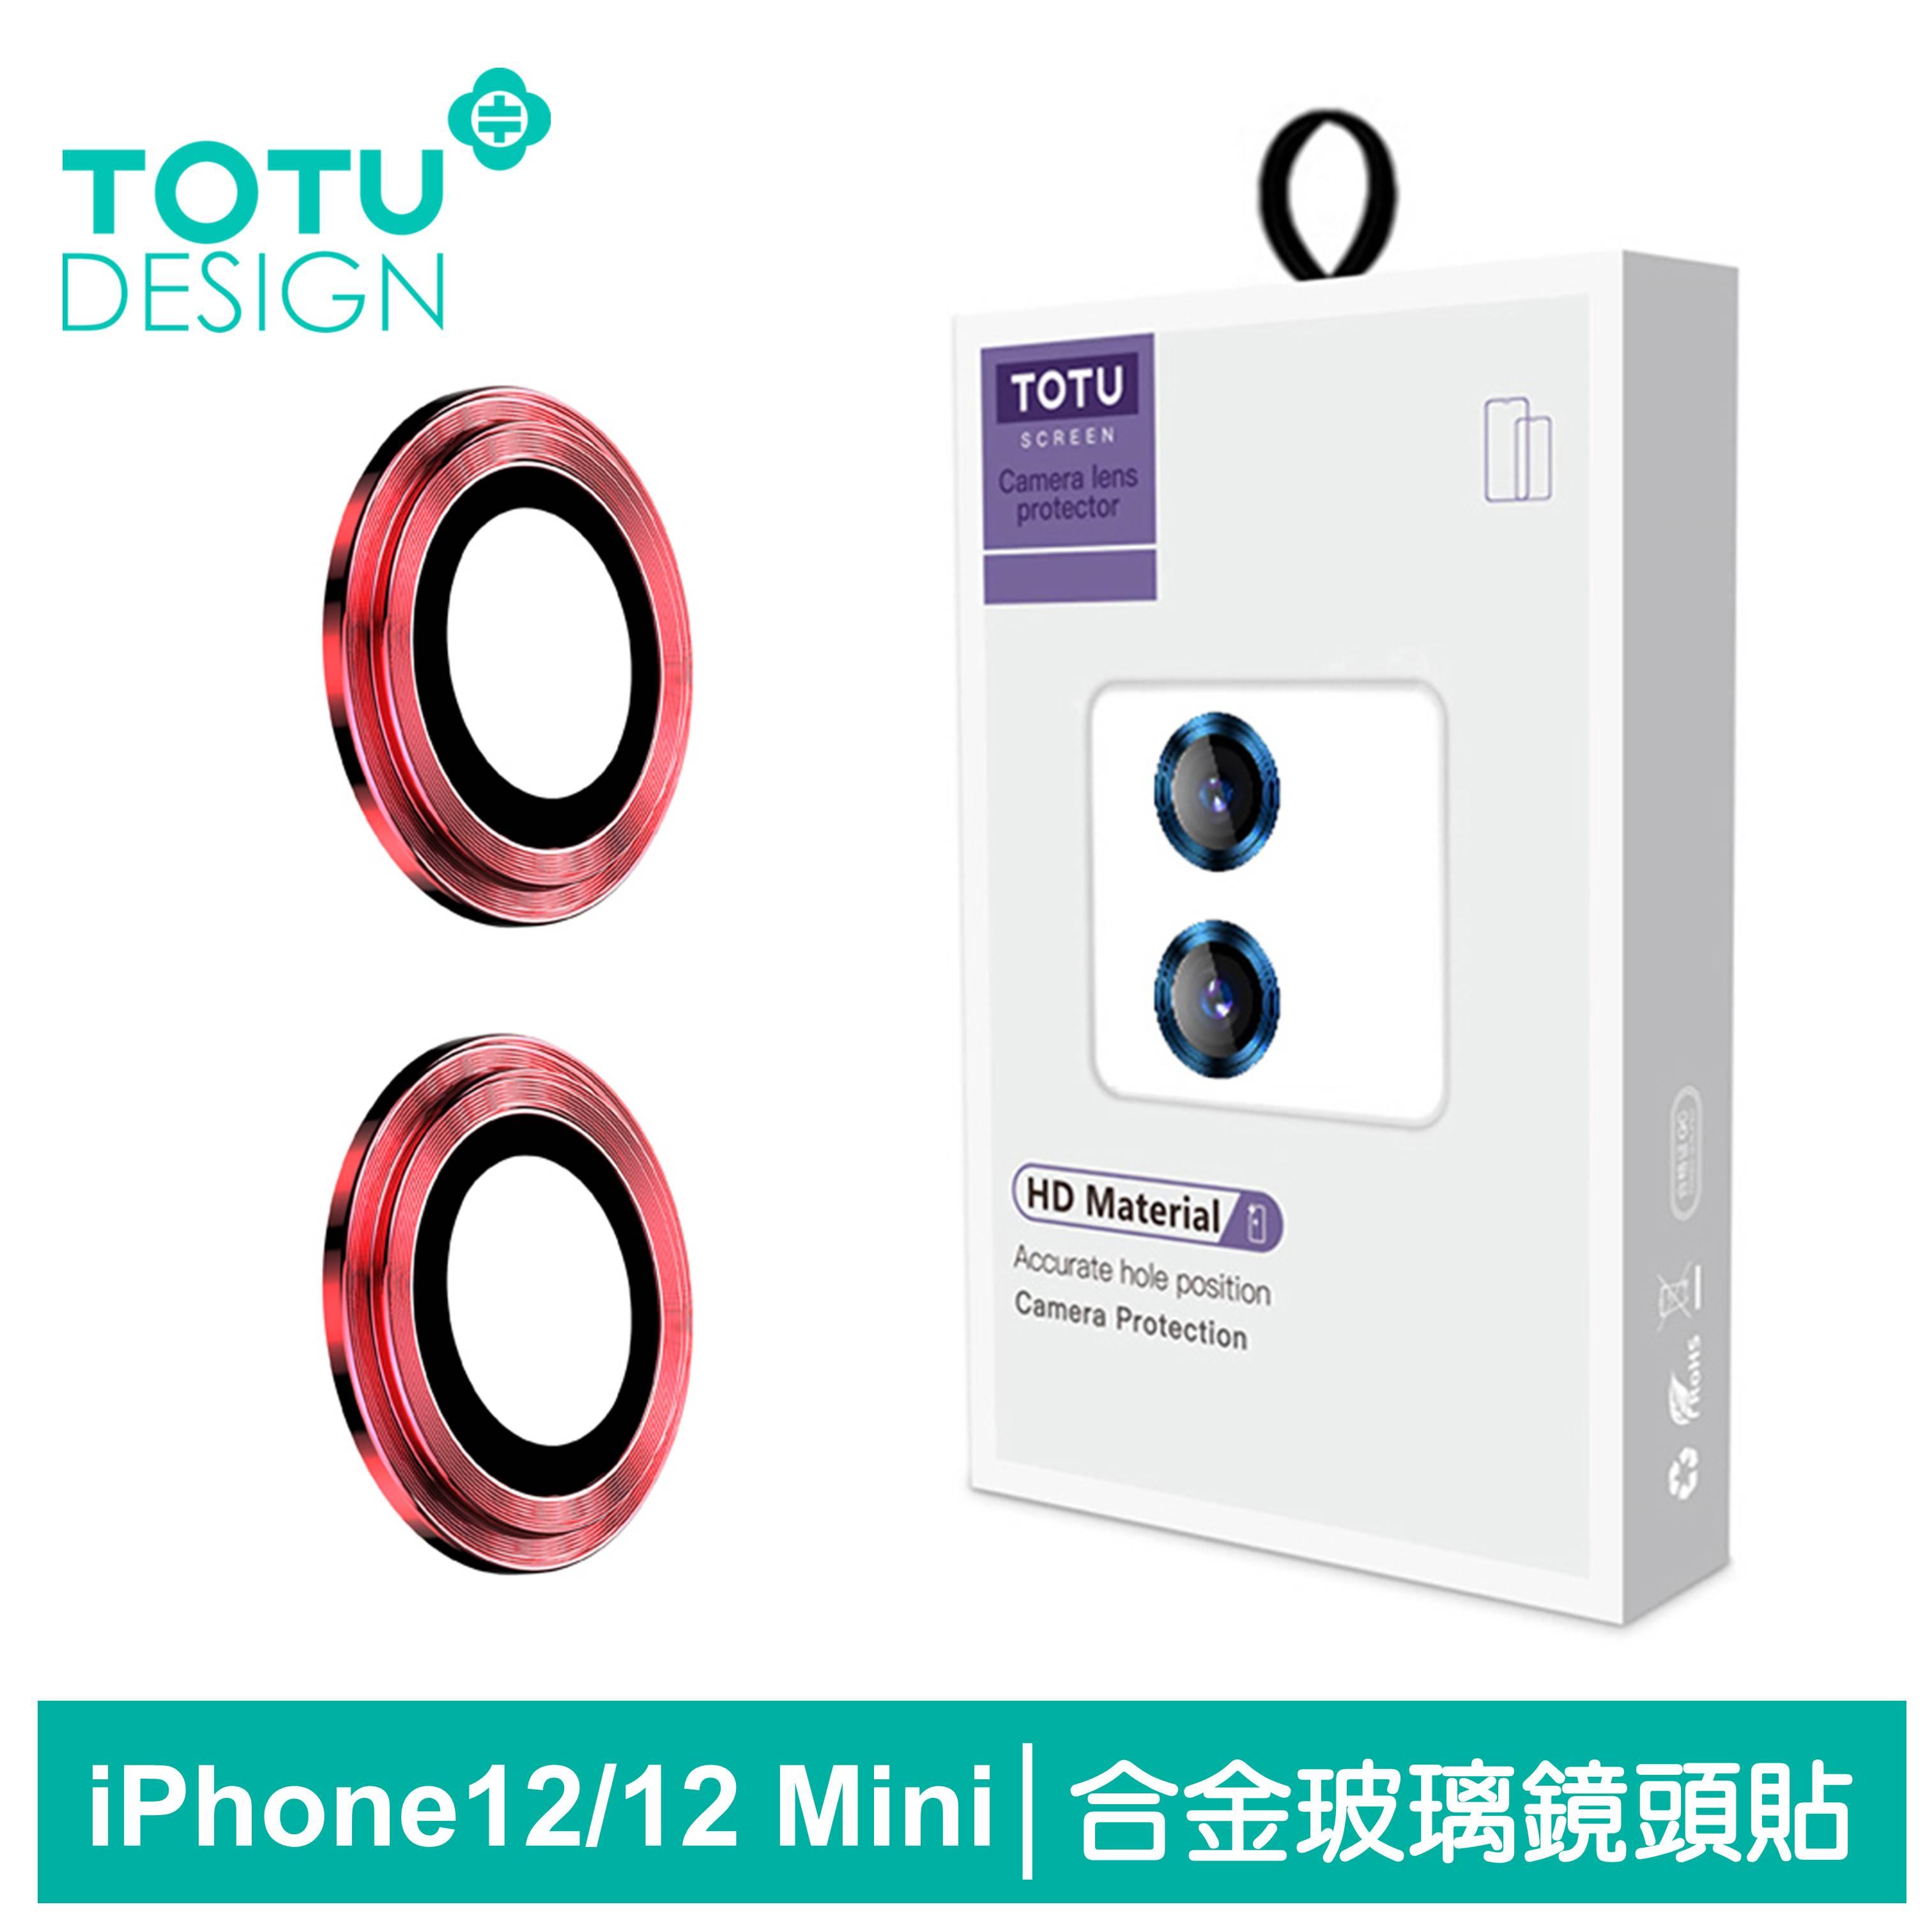 TOTU台灣官方 iPhone 12 /12 Mini 鏡頭貼 i12 Mini 鋼化膜 保護貼 鋁合金鋼化玻璃 金盾系列 紅色